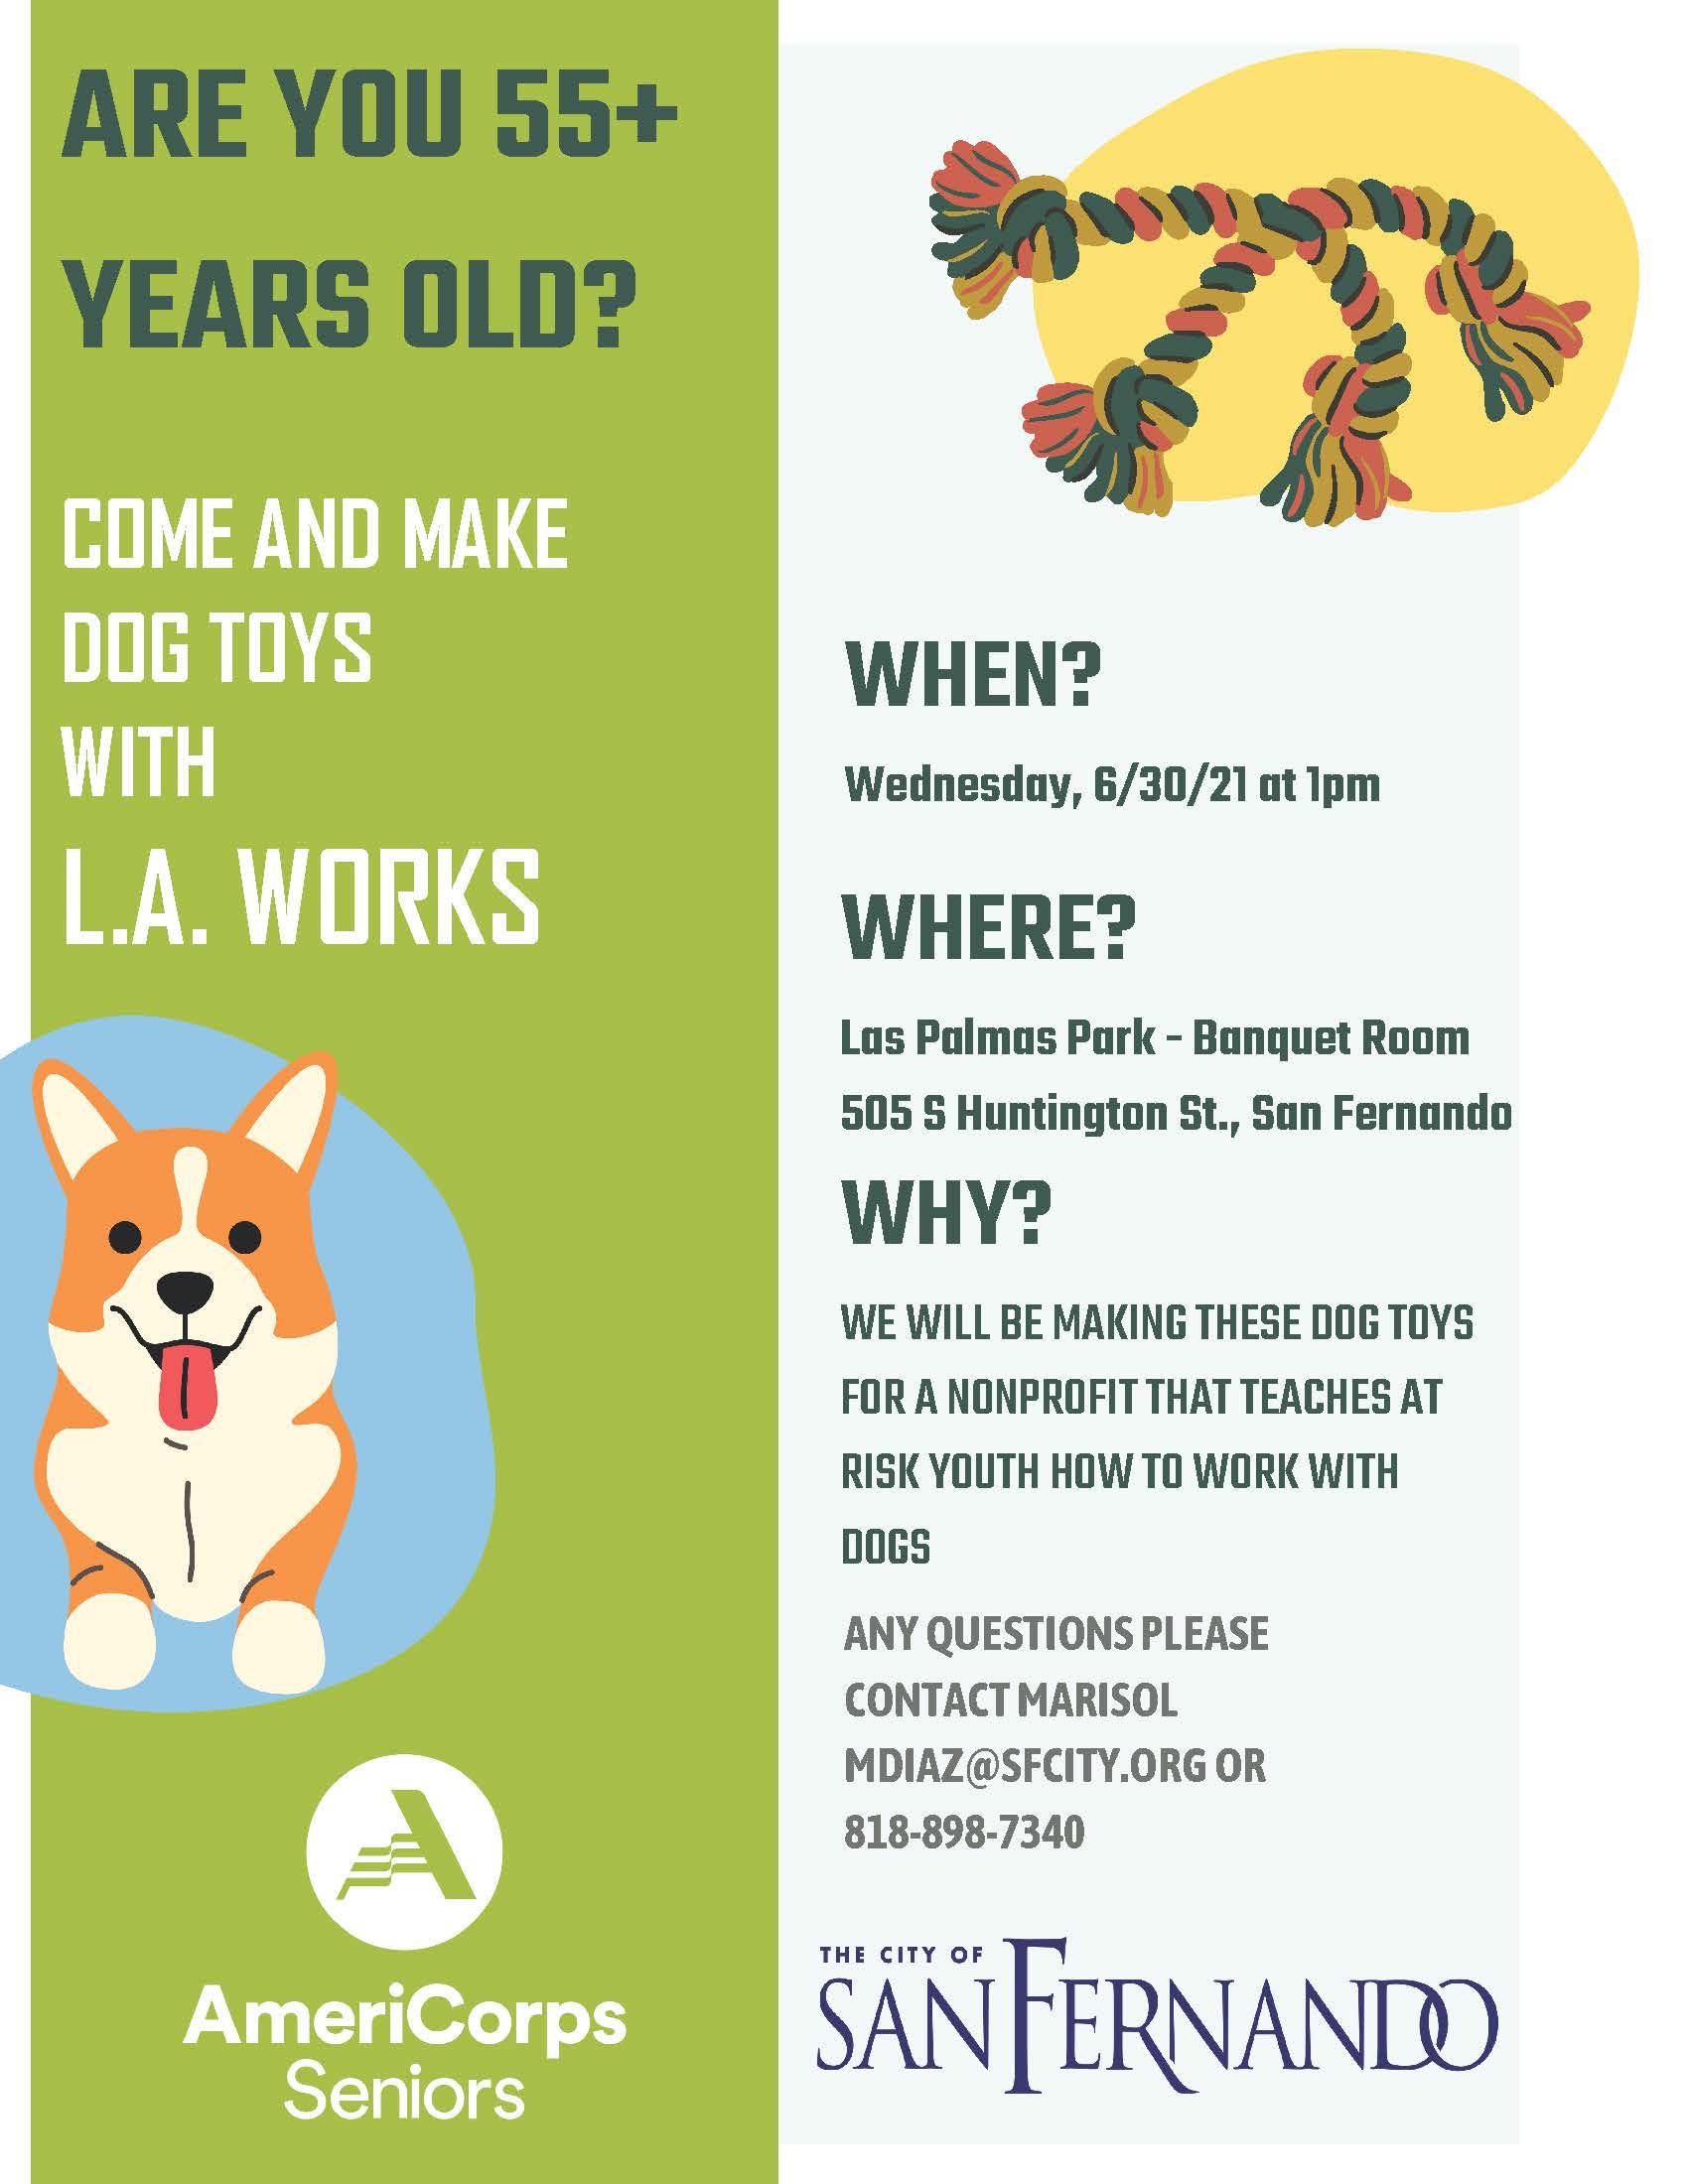 Make Dog Toys (6-30-21)